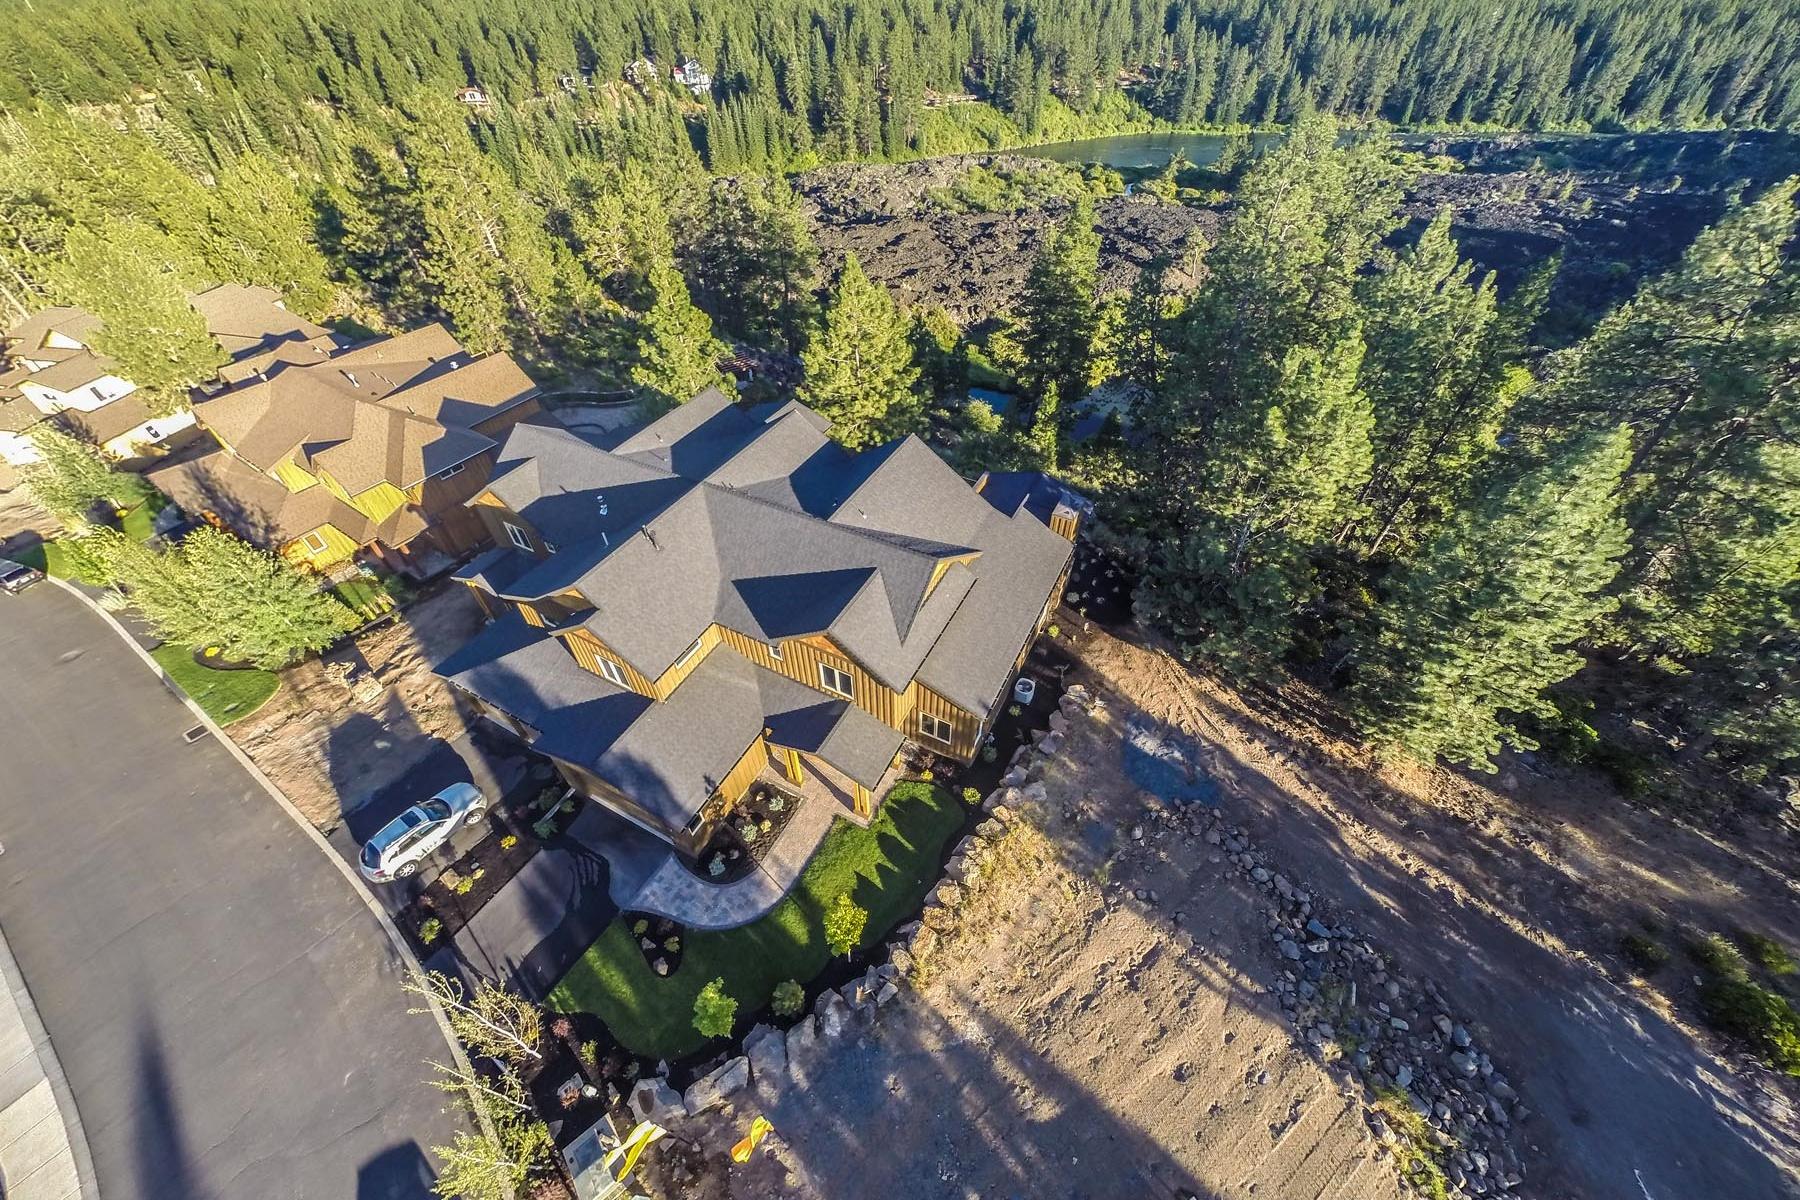 Single Family Home for Sale at 60418 Snap Shot Loop 60418 Snap Shot Loop Lot 32 Bend, Oregon 97702 United States